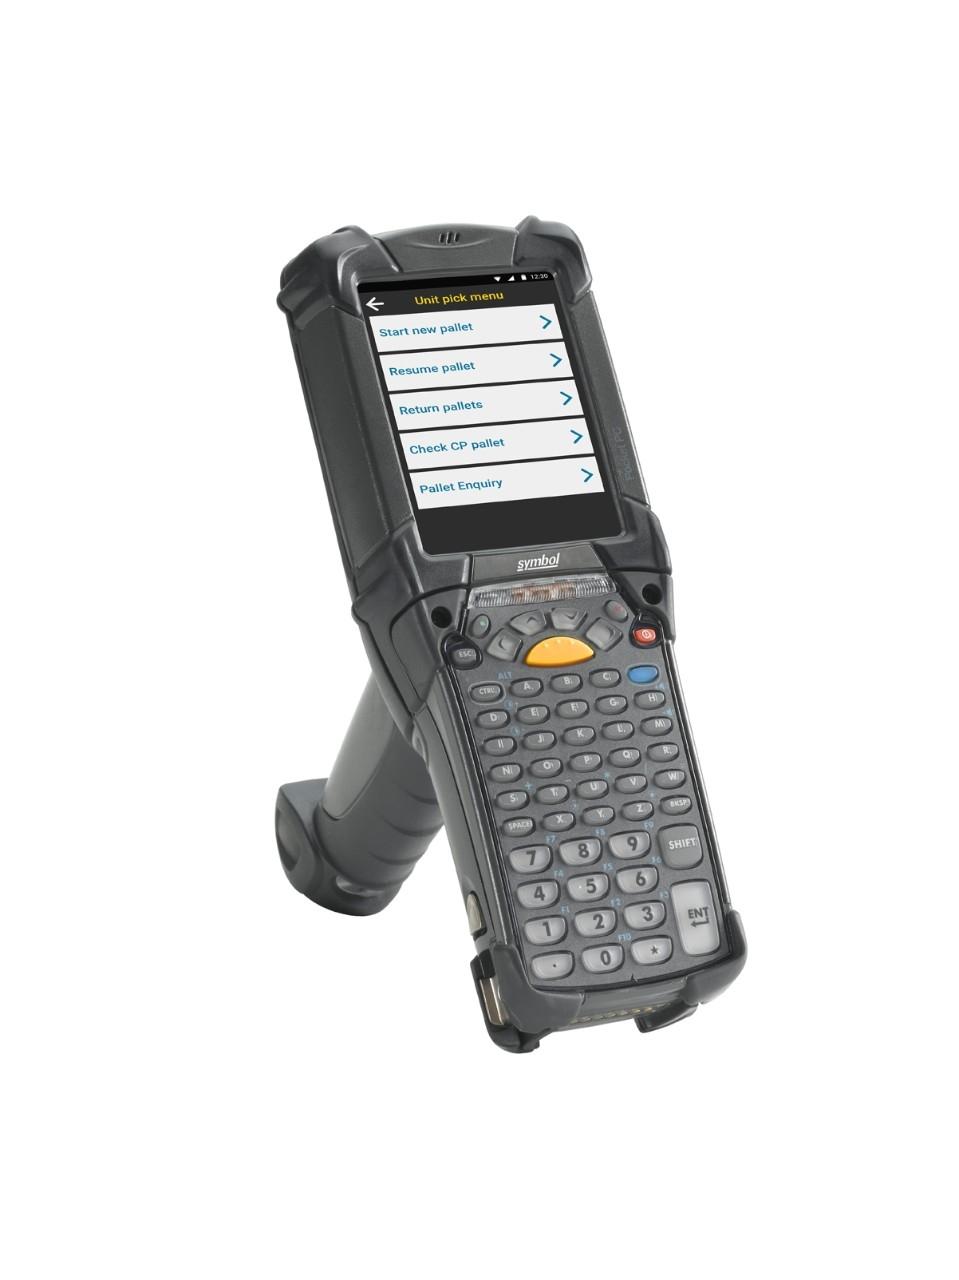 Vista lateral derecha de la computadora móvilMC9200 Android de Zebra